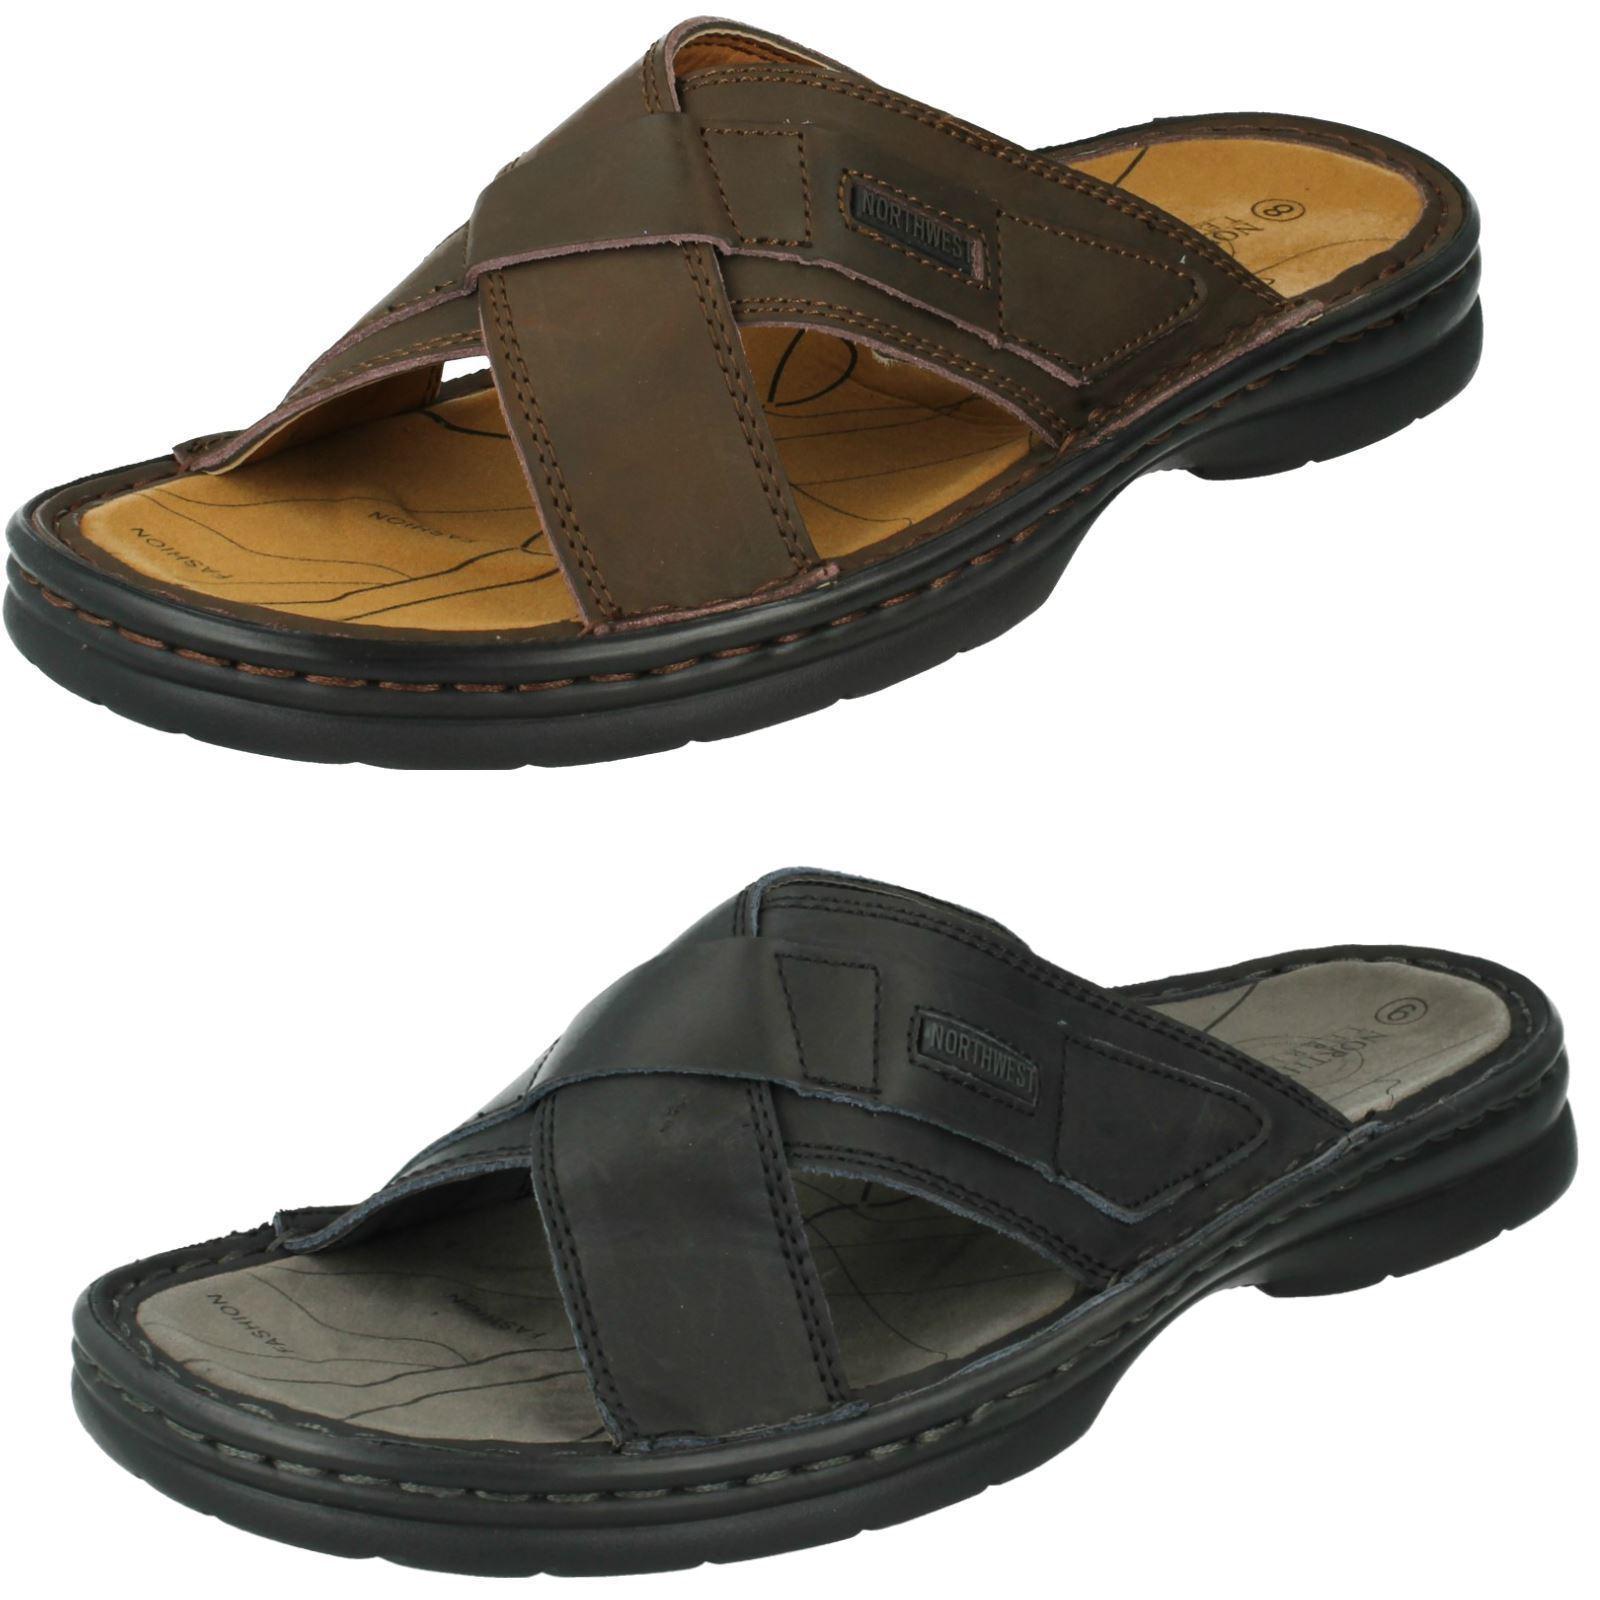 Men's Northwest Territory Sandals - Sahara